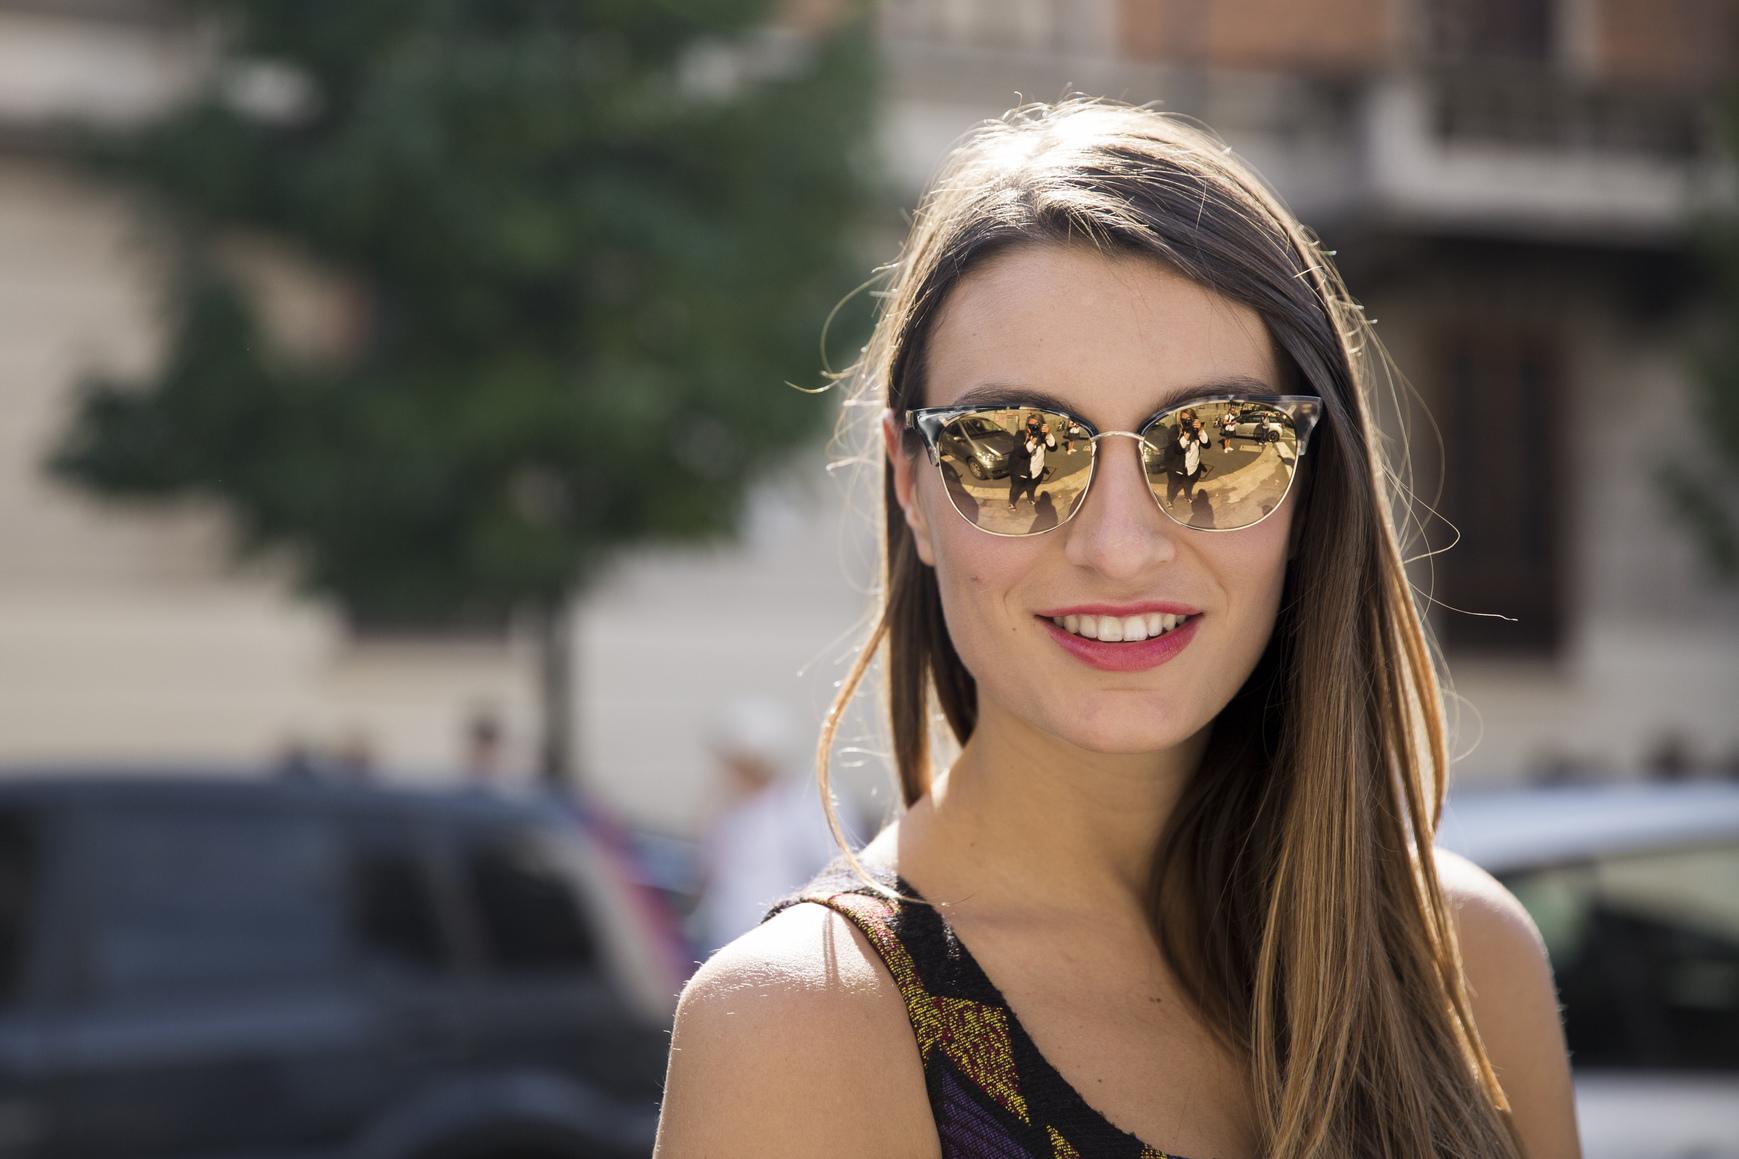 Lustrzane okulary